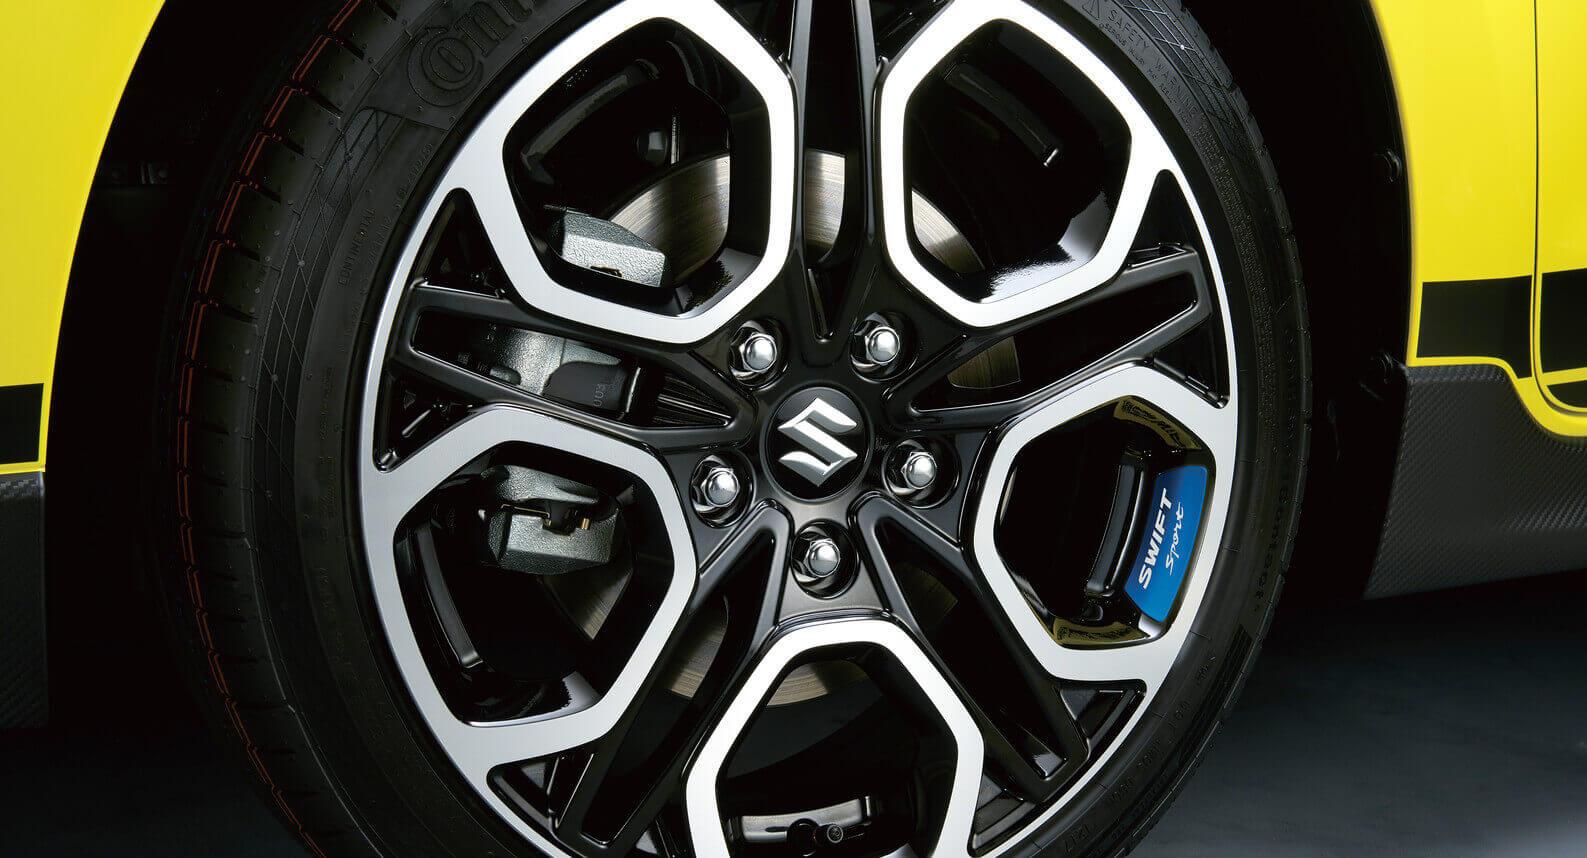 Wheel Decal - Blue